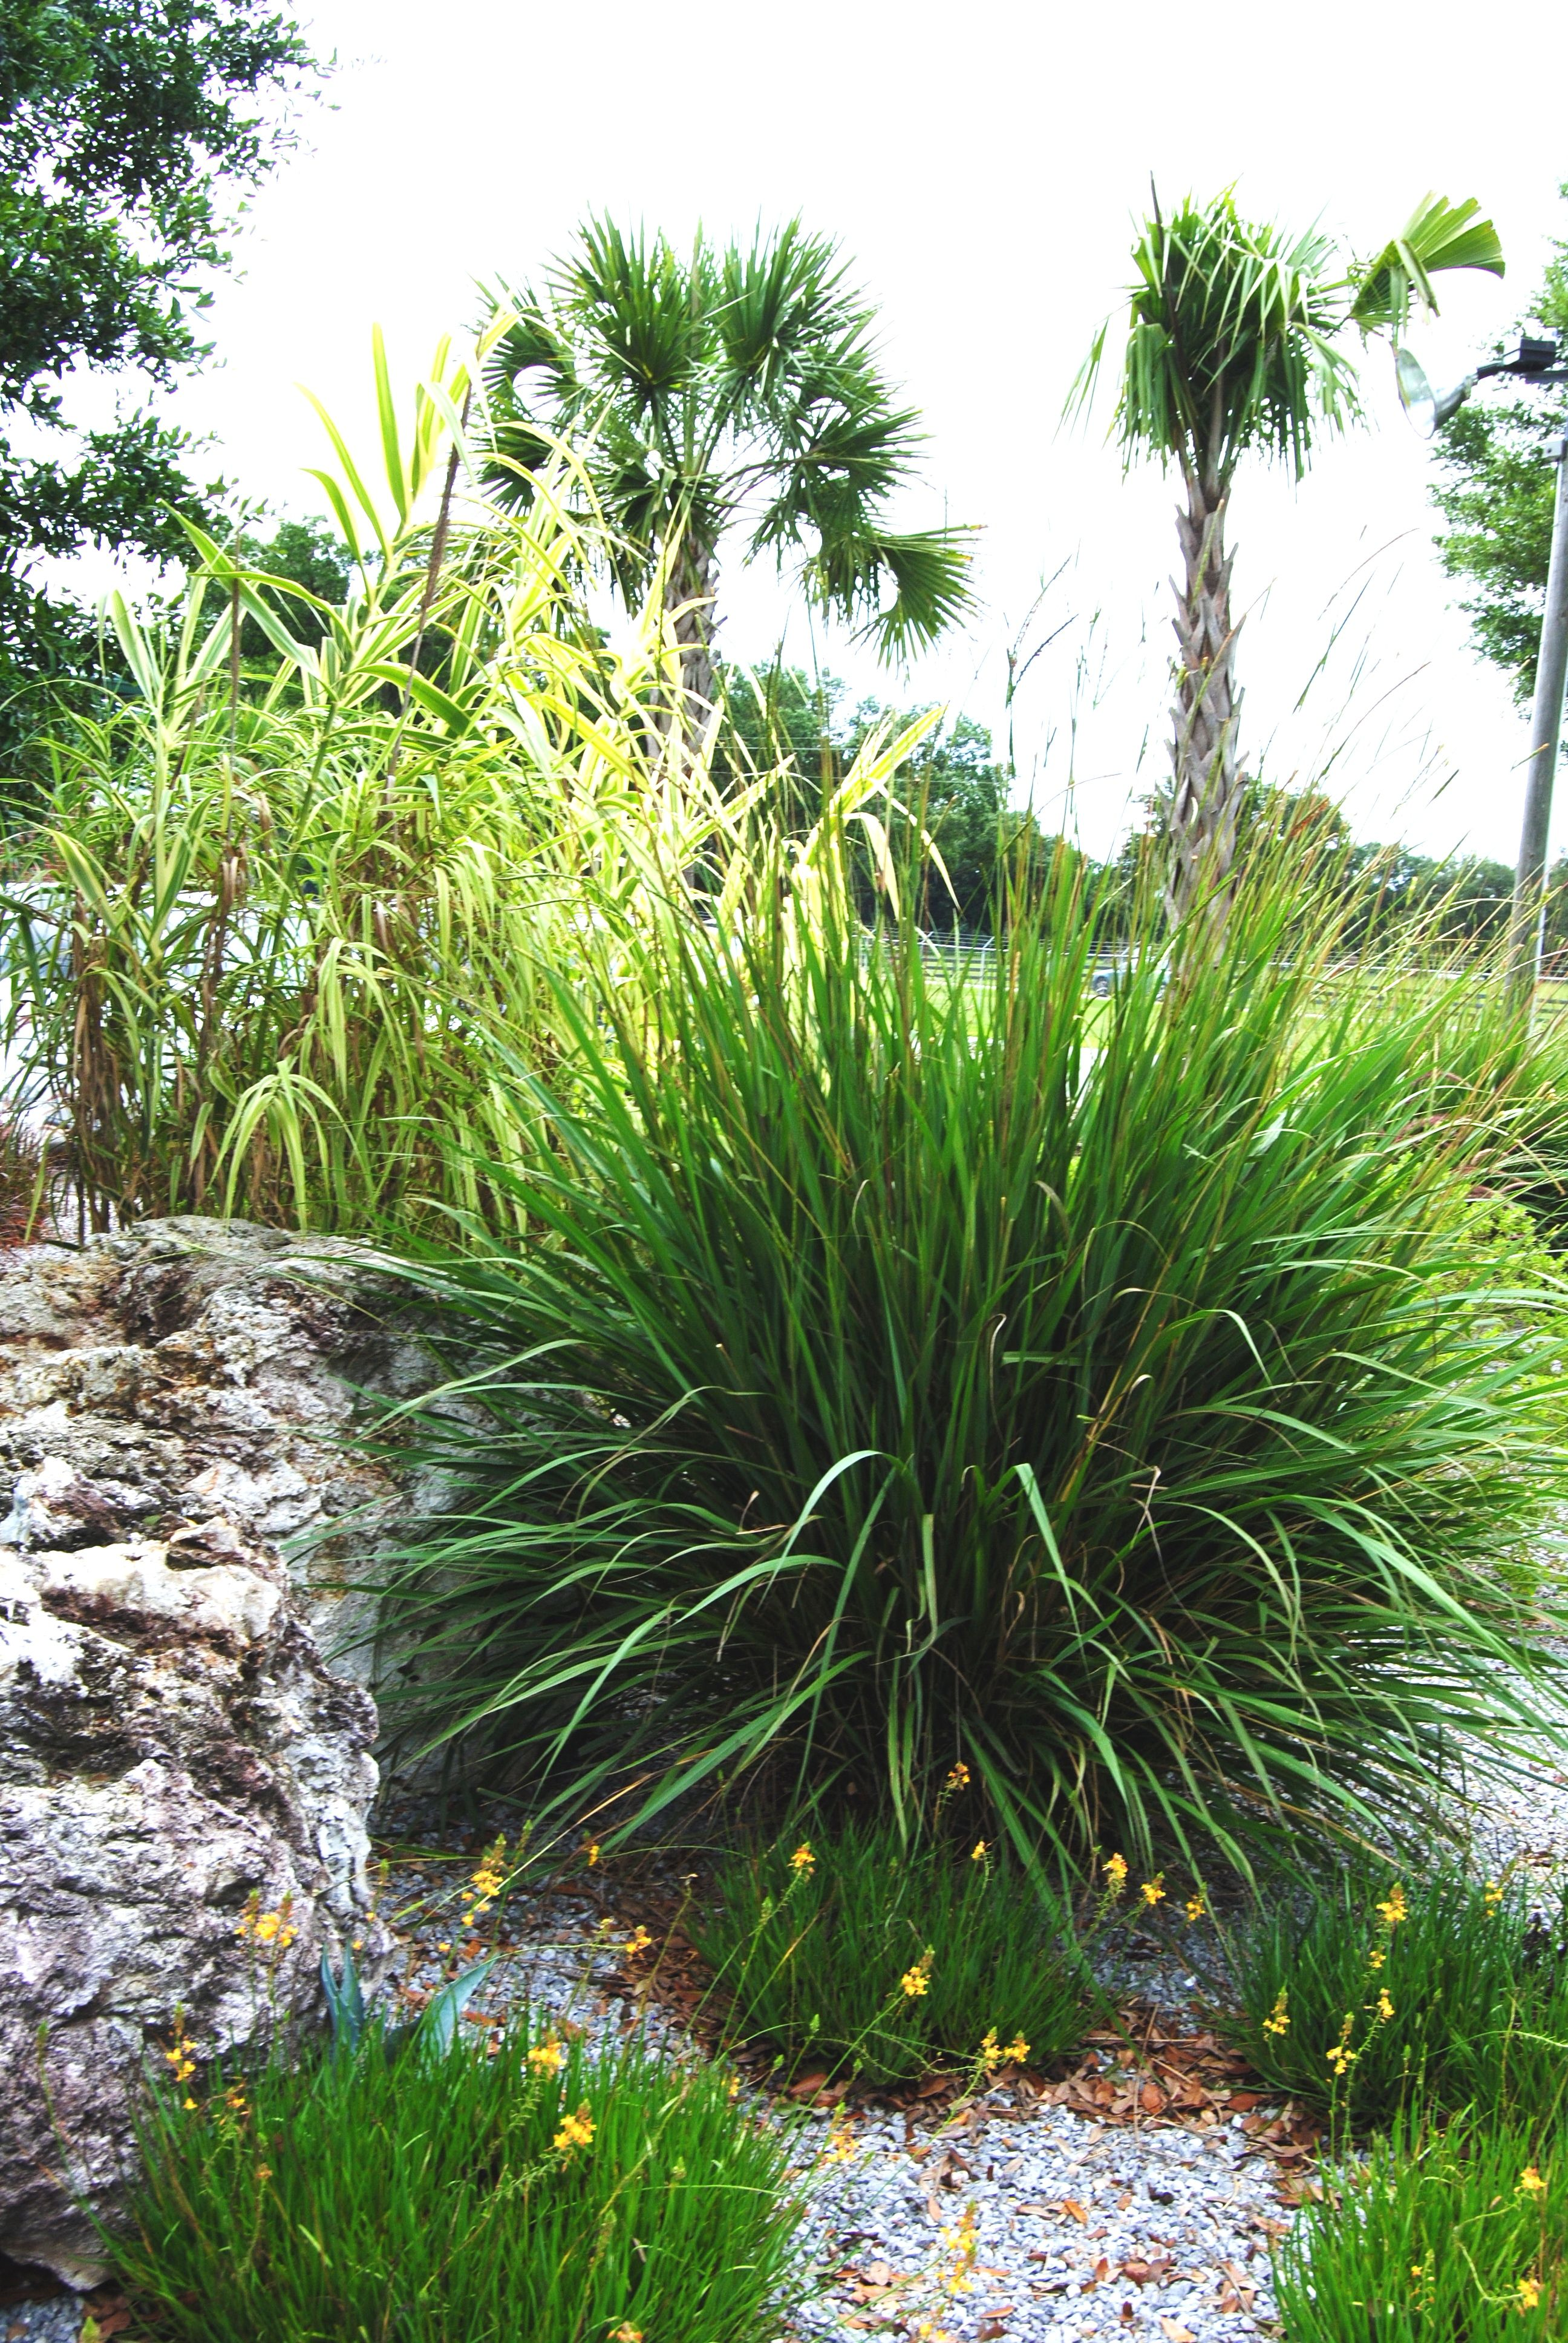 Pin By Teresa Watkins On Garden Of Grasses - Pinterest